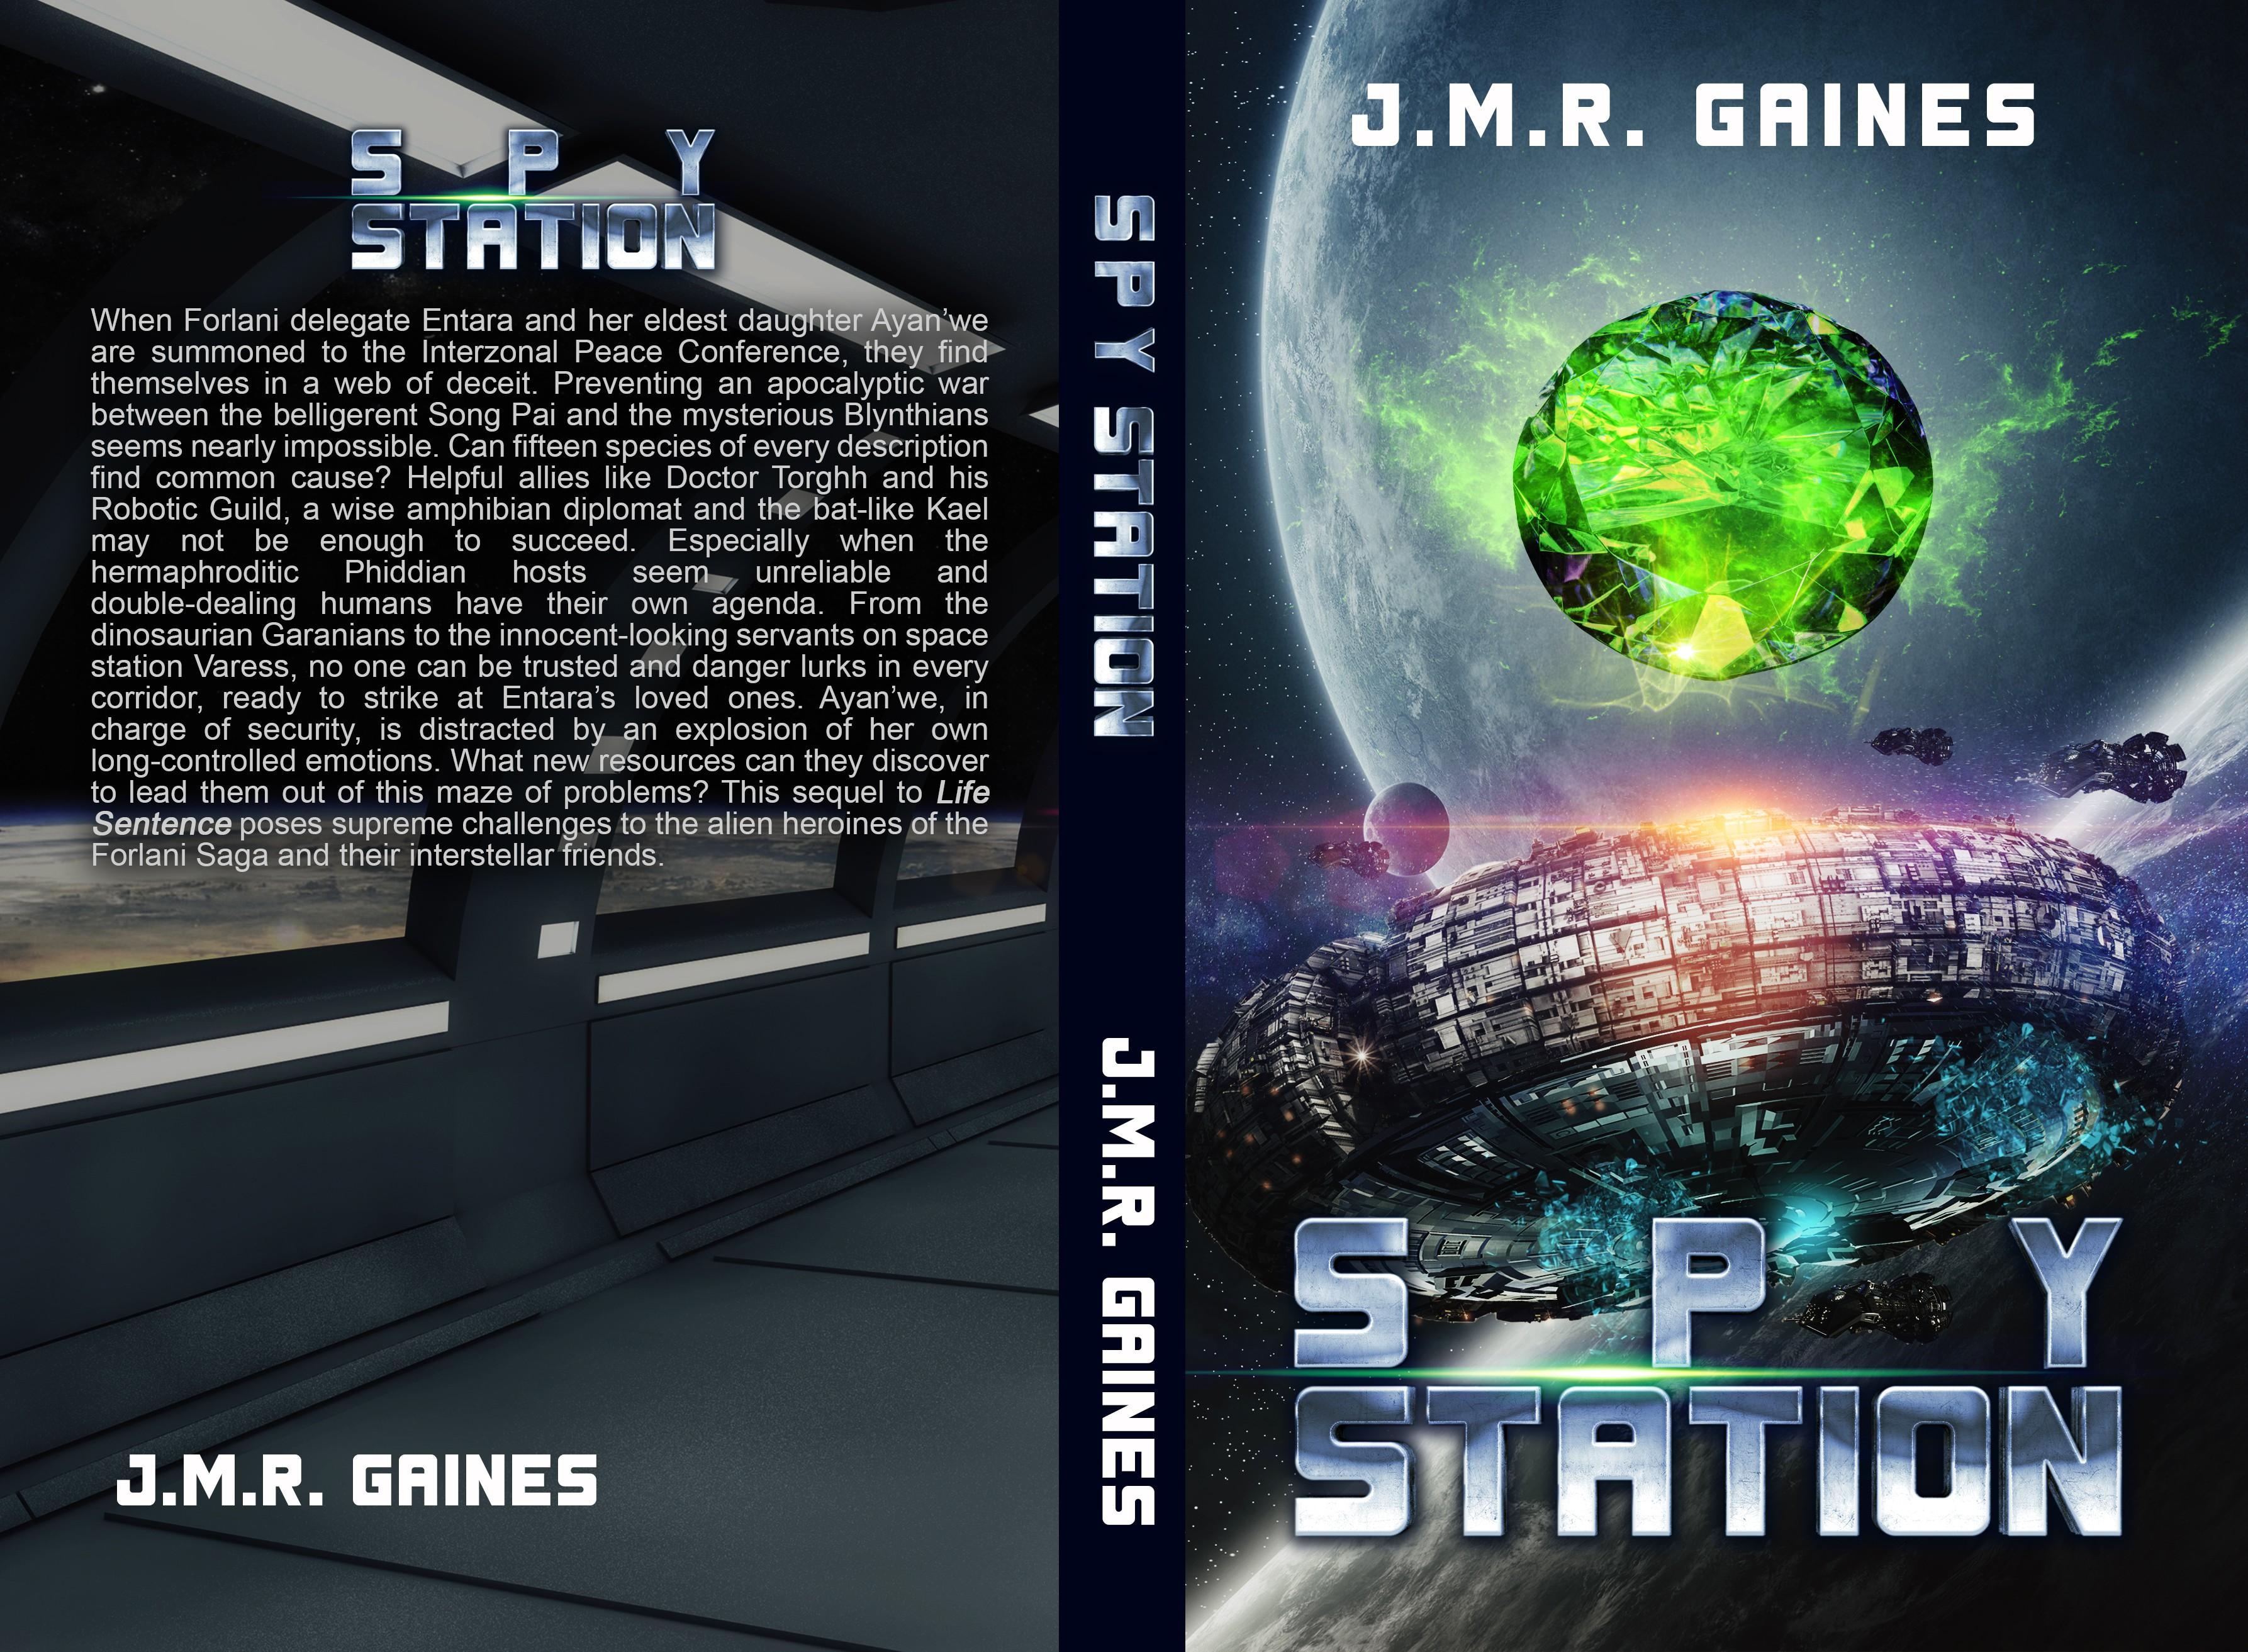 Spy Station Cover